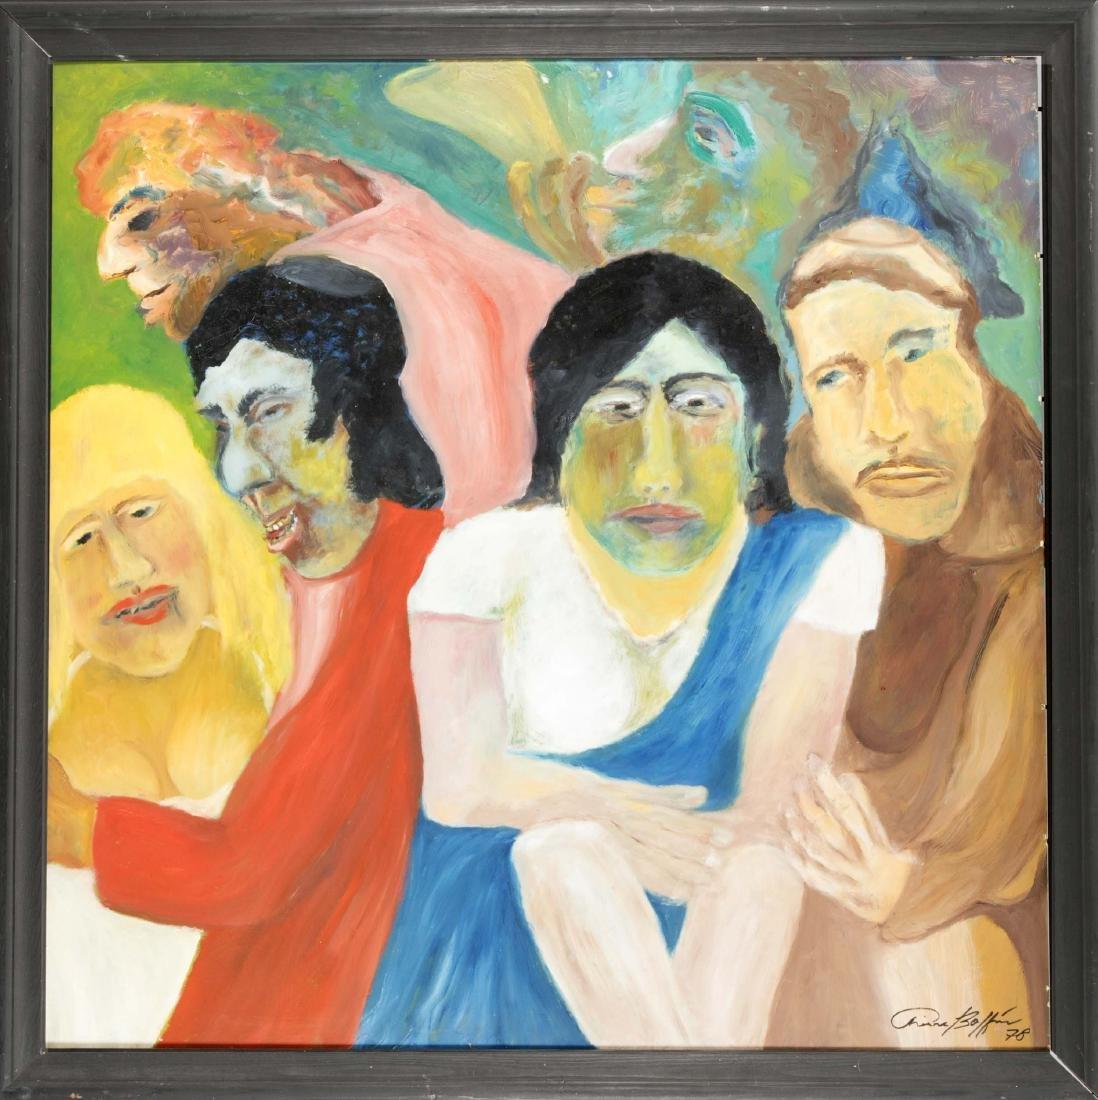 Pierre Boffin (1907-1991), German Artist from Aachen,